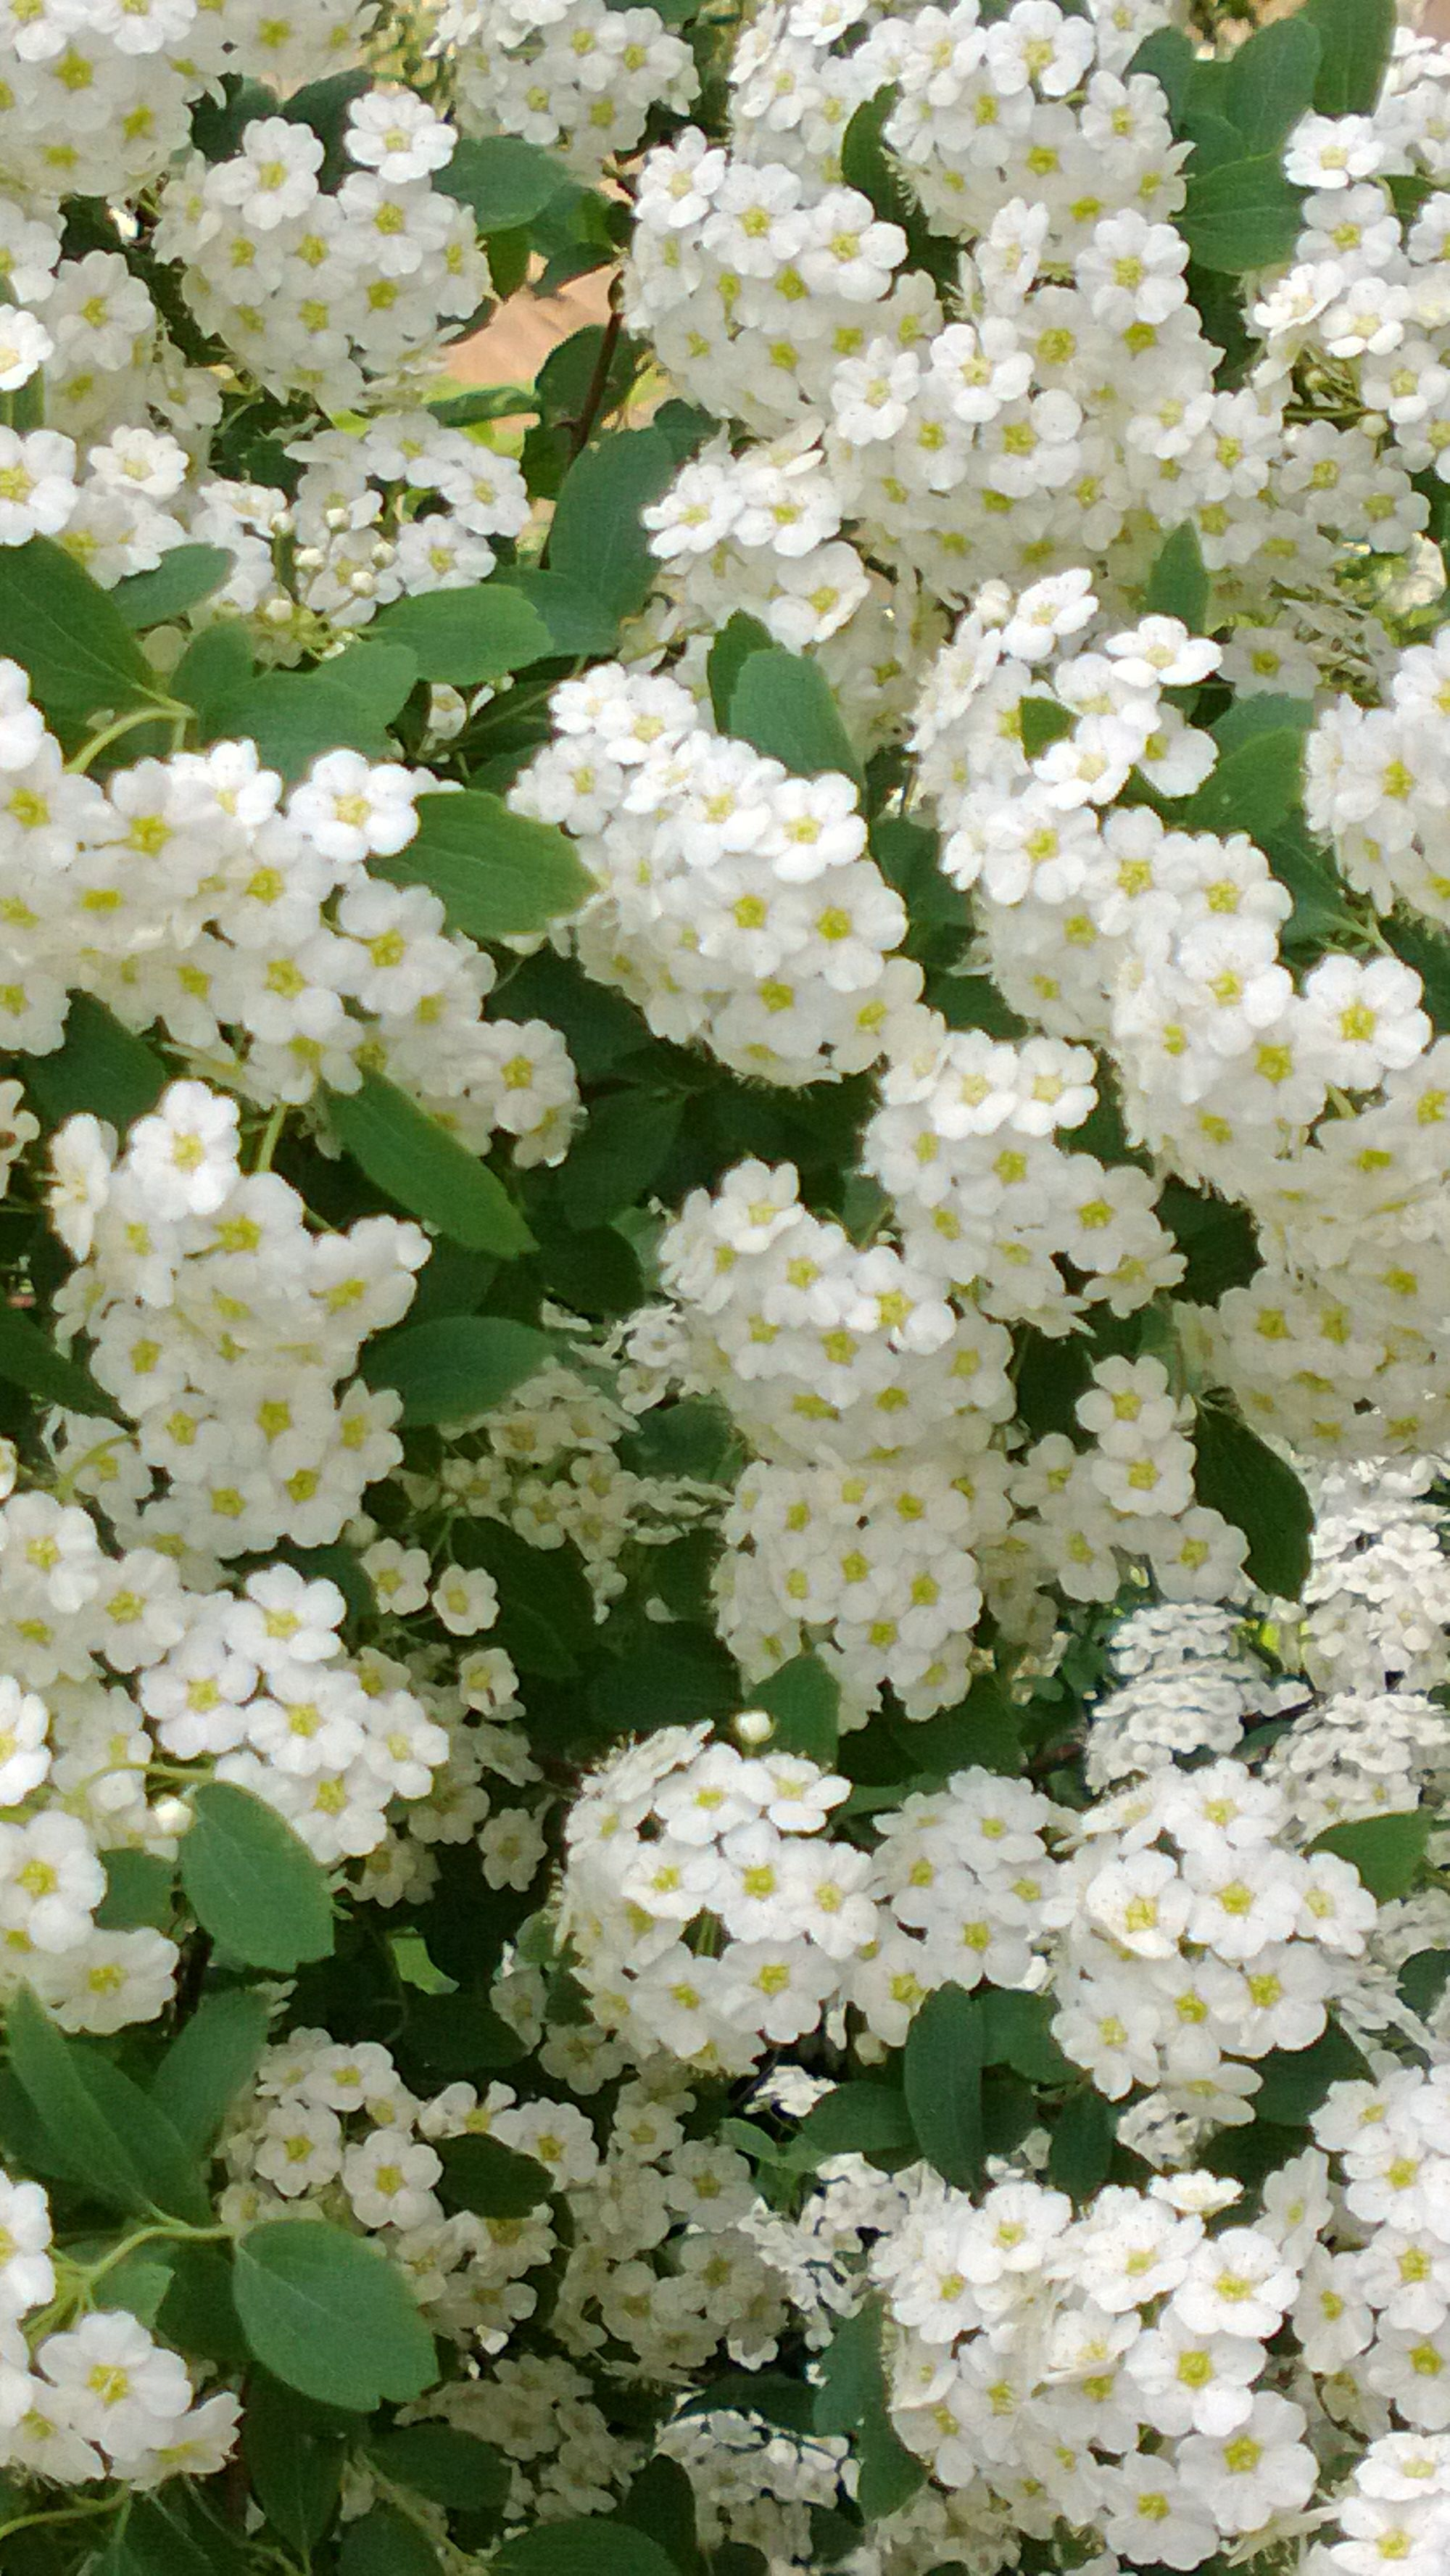 Bridal Veil Spirea Beautiful It Blooms In June With